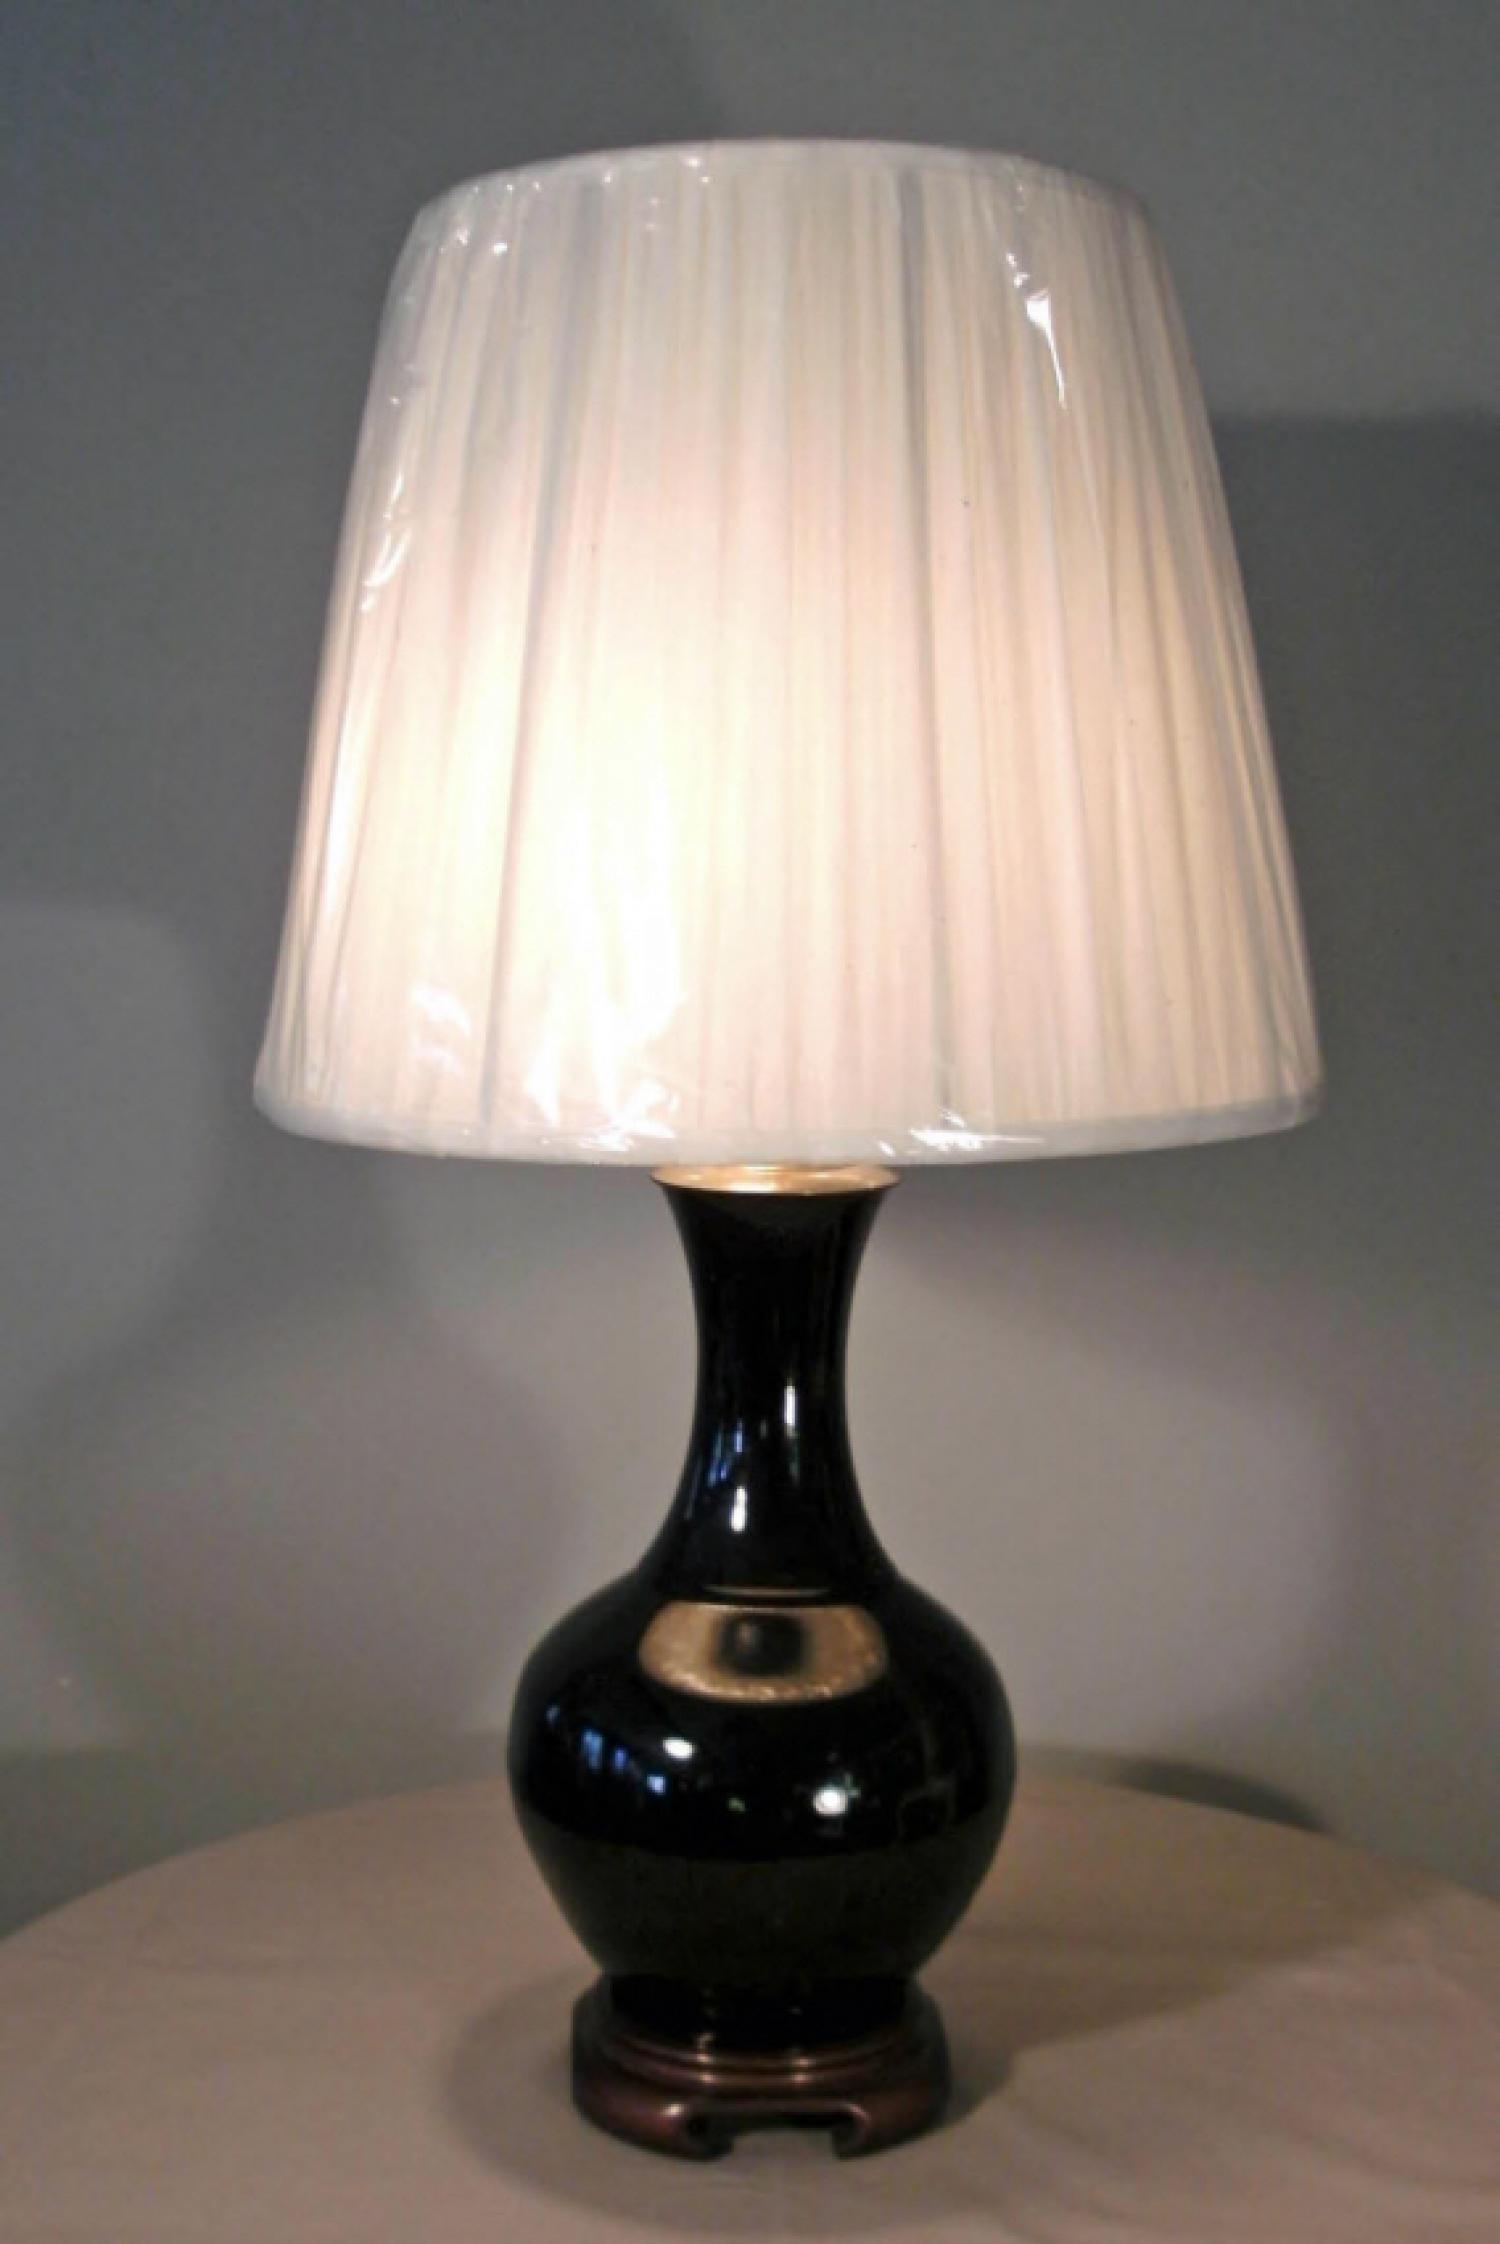 19th Century Chinese Famille Noir vase lamp c1850